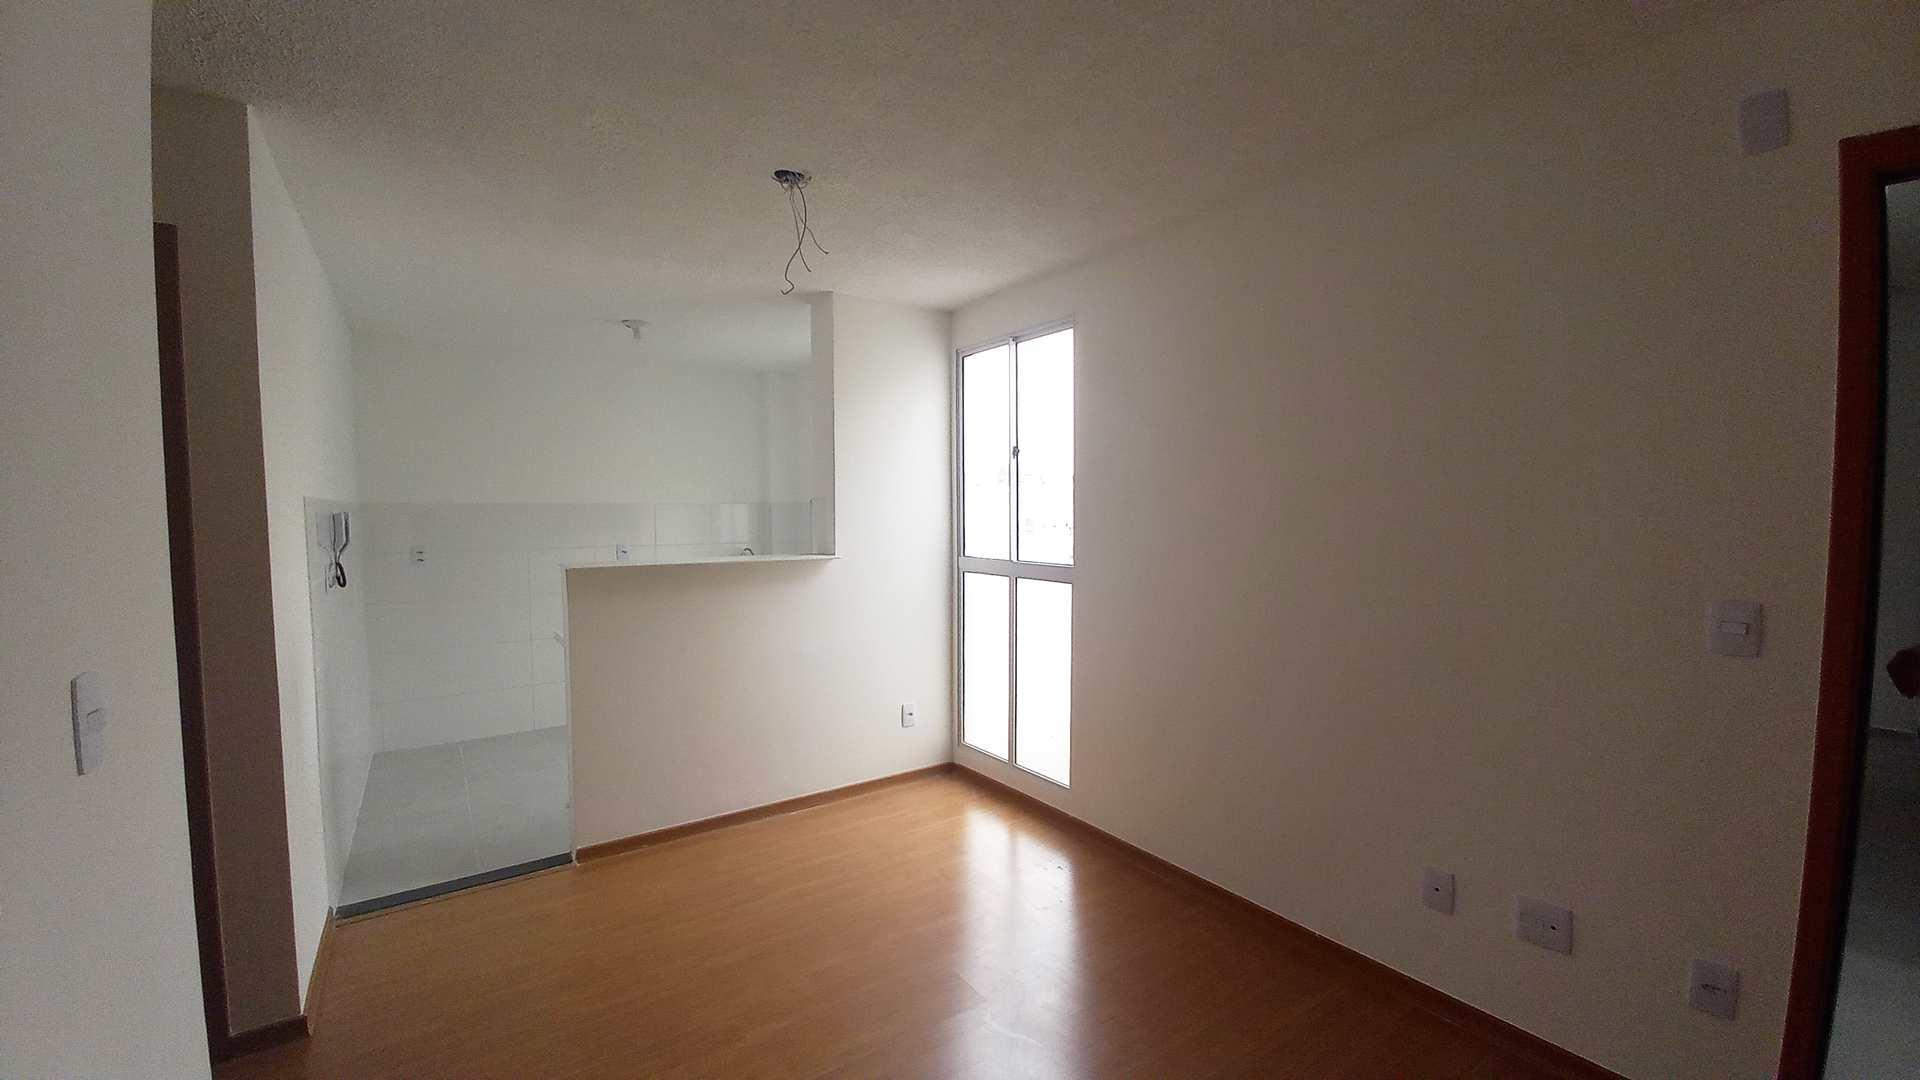 Apartamento com 2 dorms, Jardim Europa, Suzano, Cod: 1278